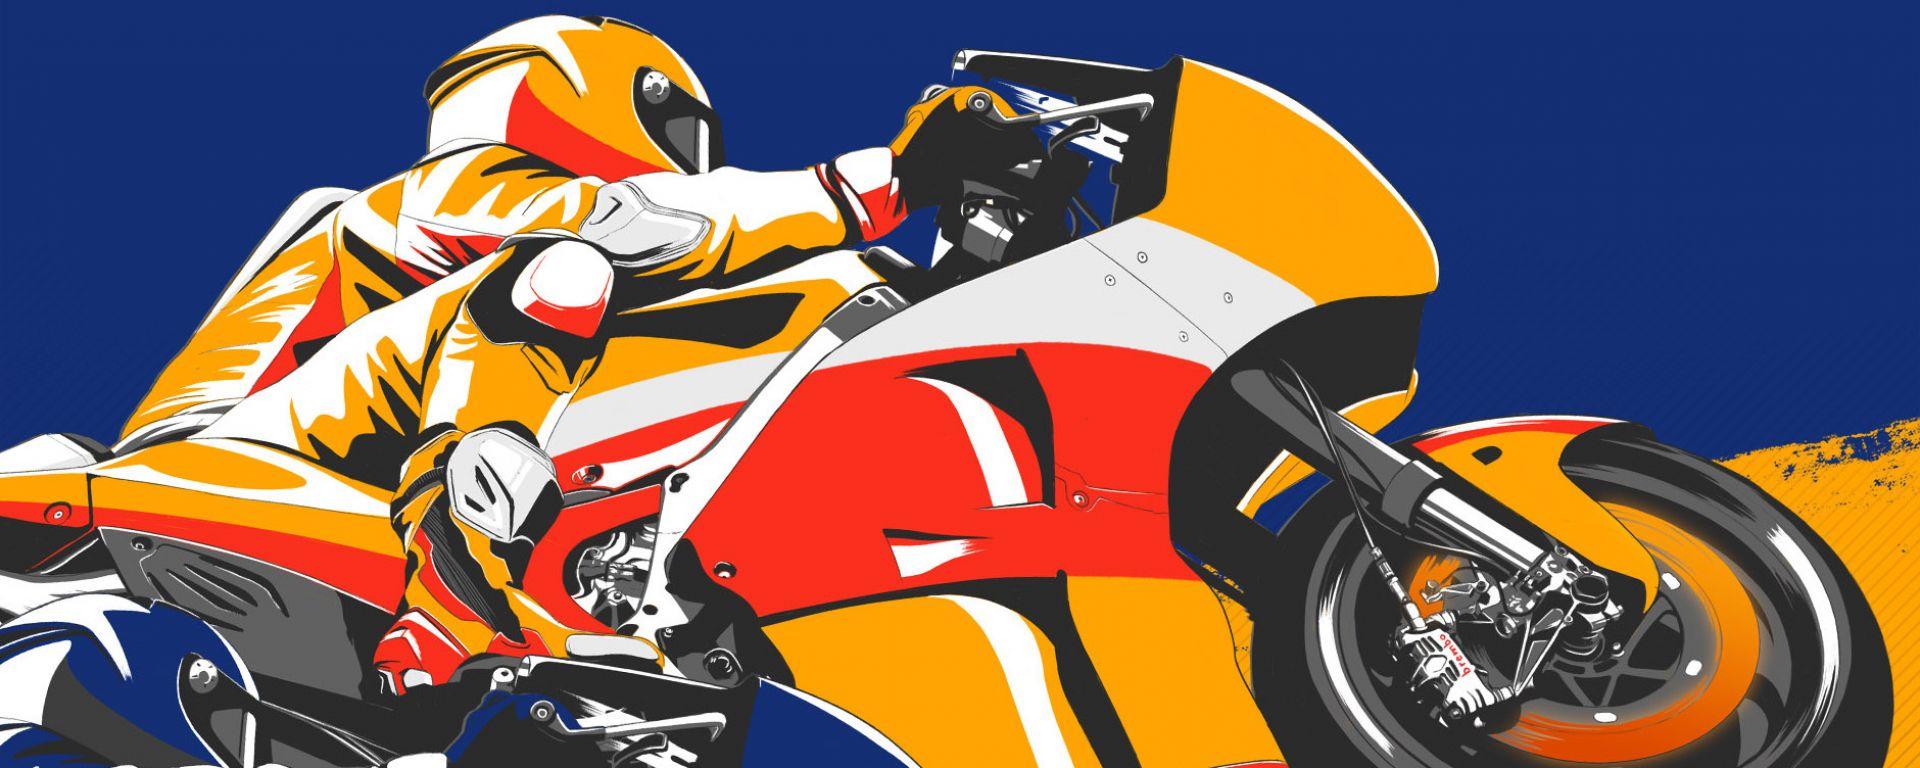 Poster sorpasso Honda su Yamaha by Brembo